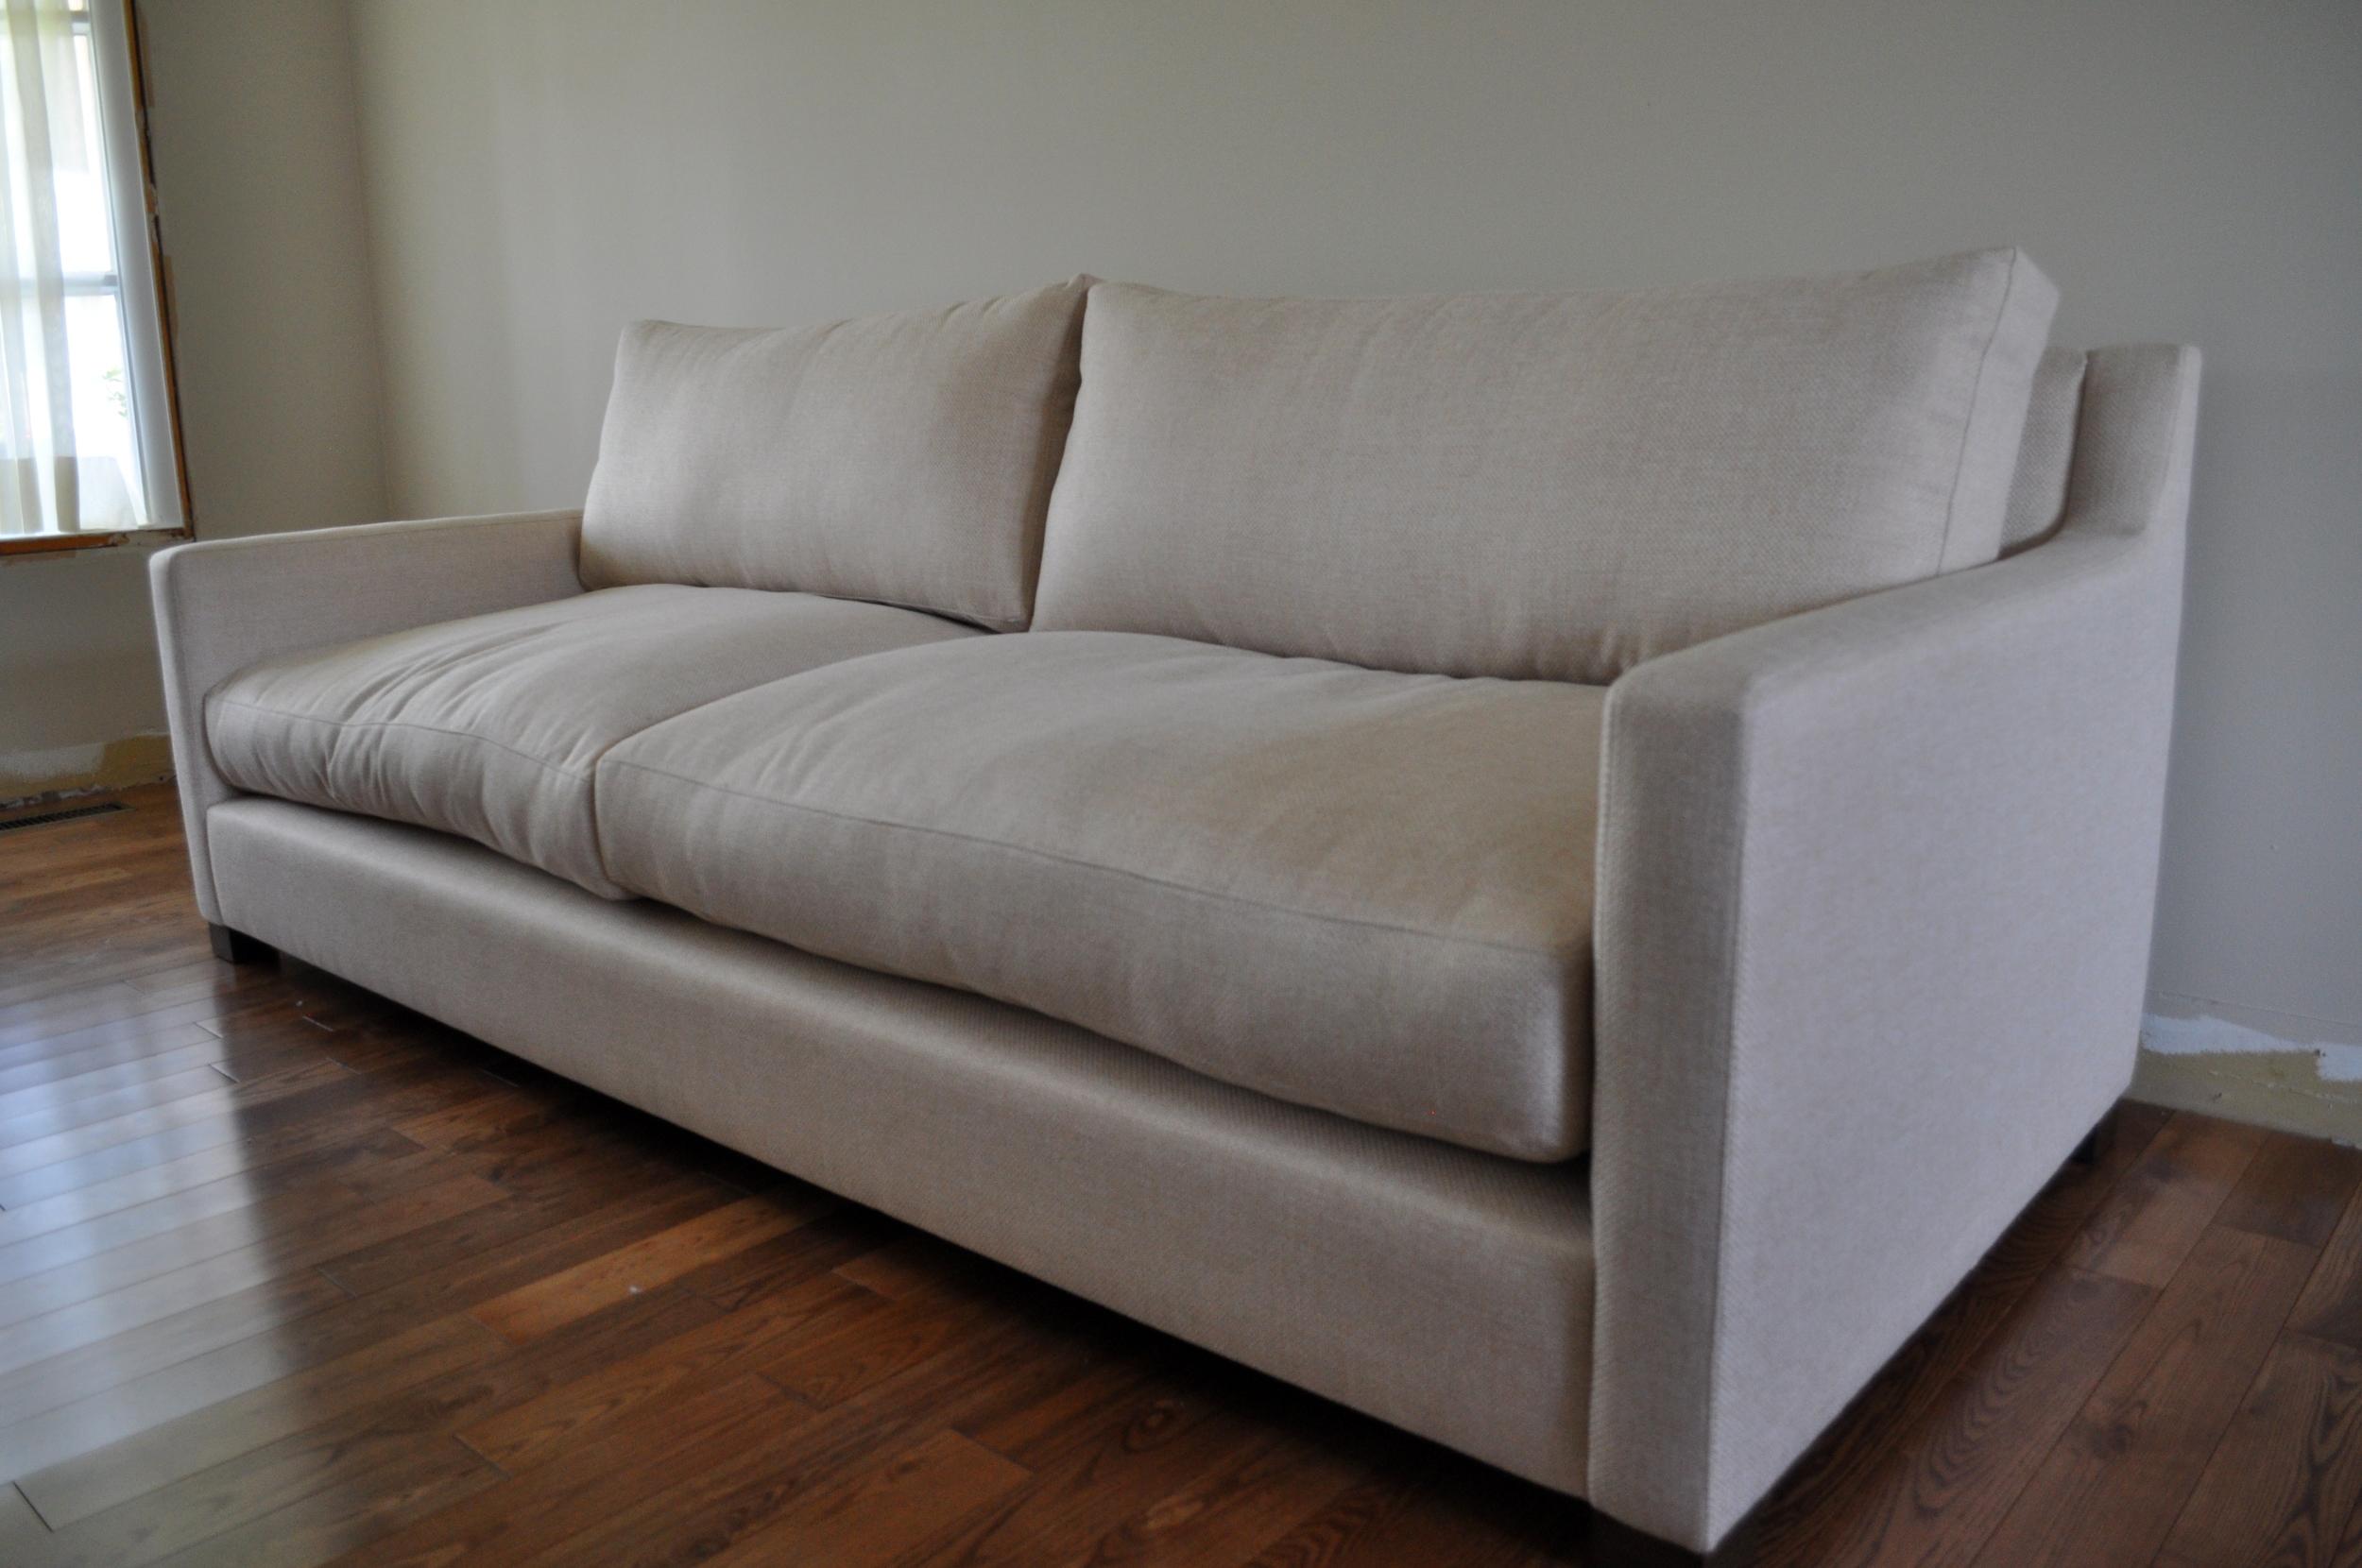 Cream Sofa, Angle view